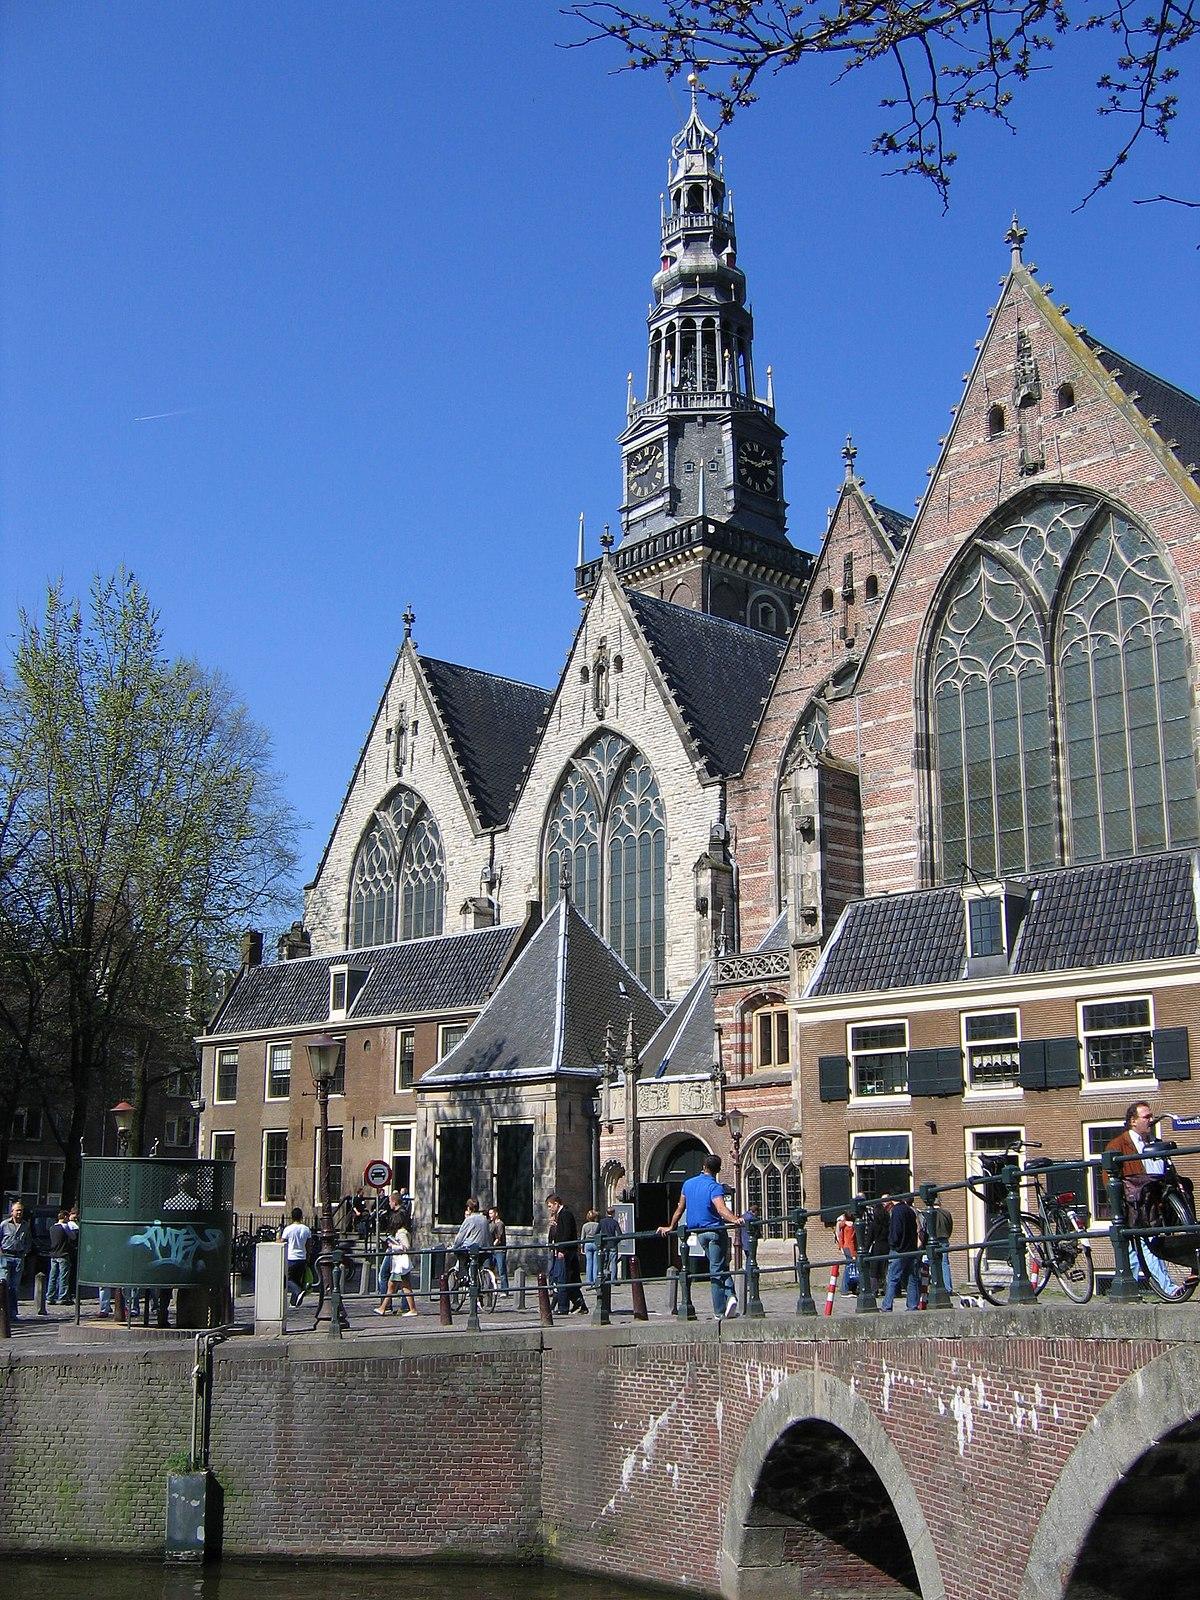 Oude kerk amsterdam wikipedia - Afbeelding in ...